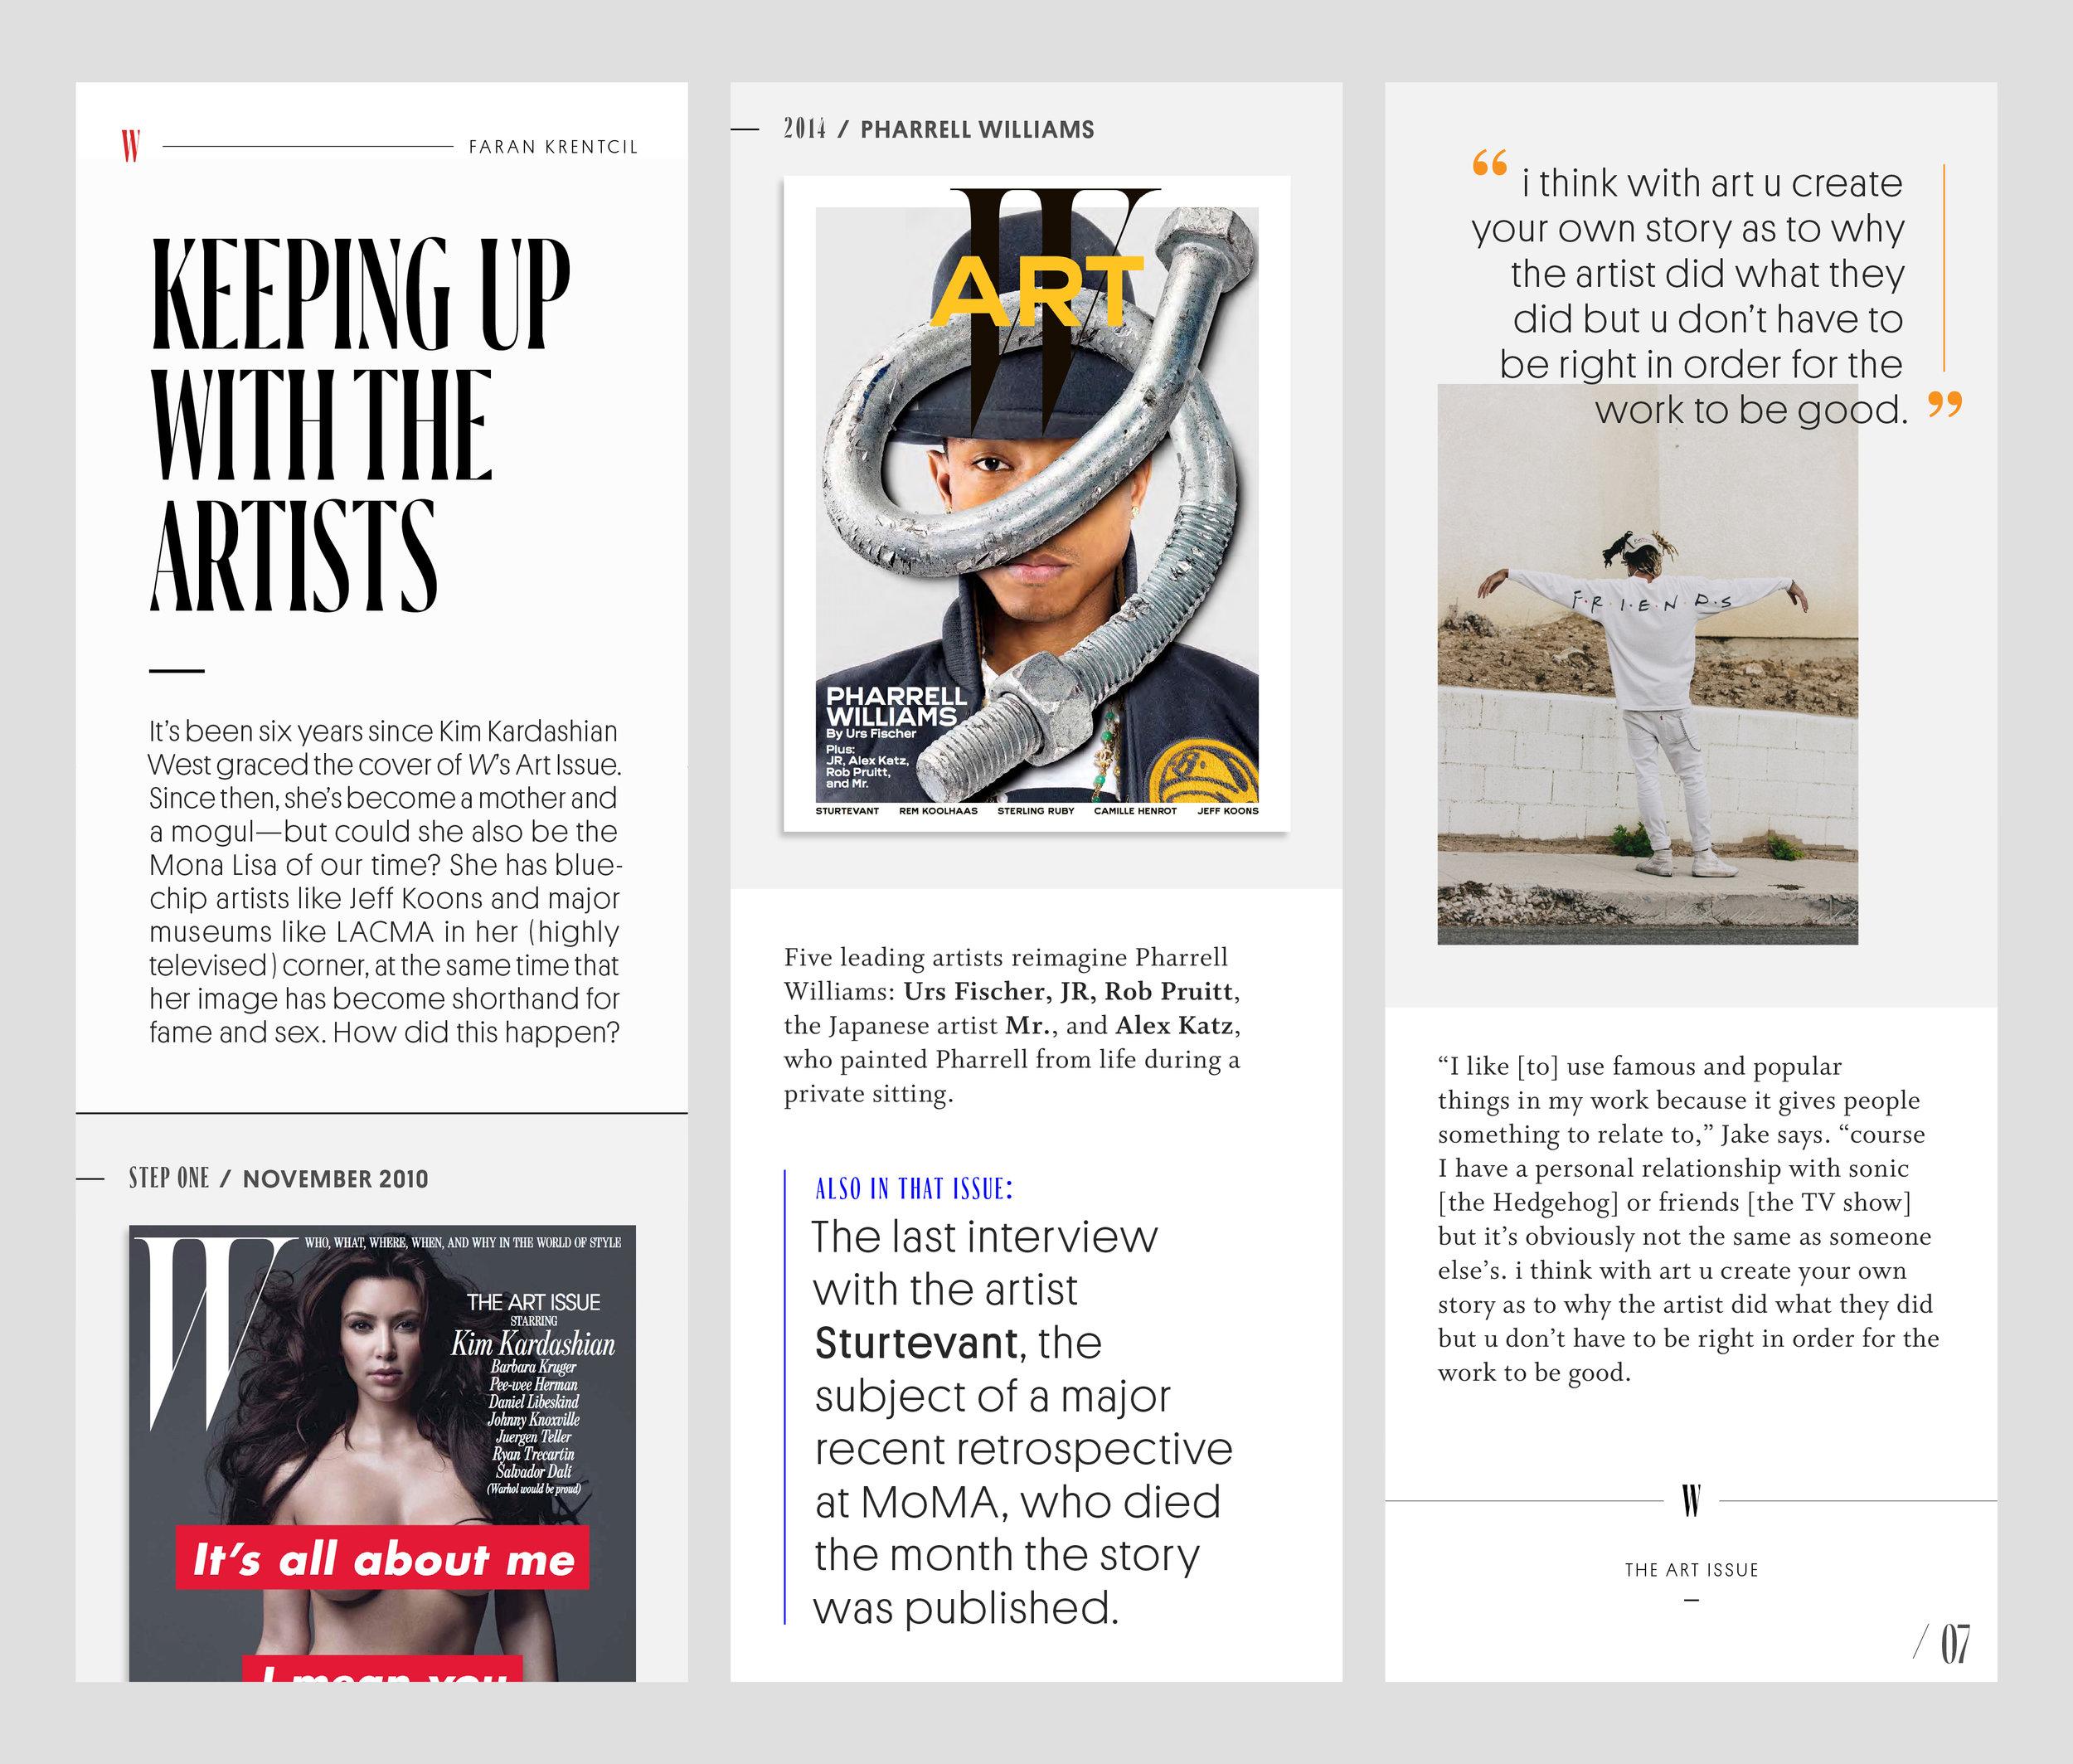 W_SnapchatDiscover_Article_Design.jpg